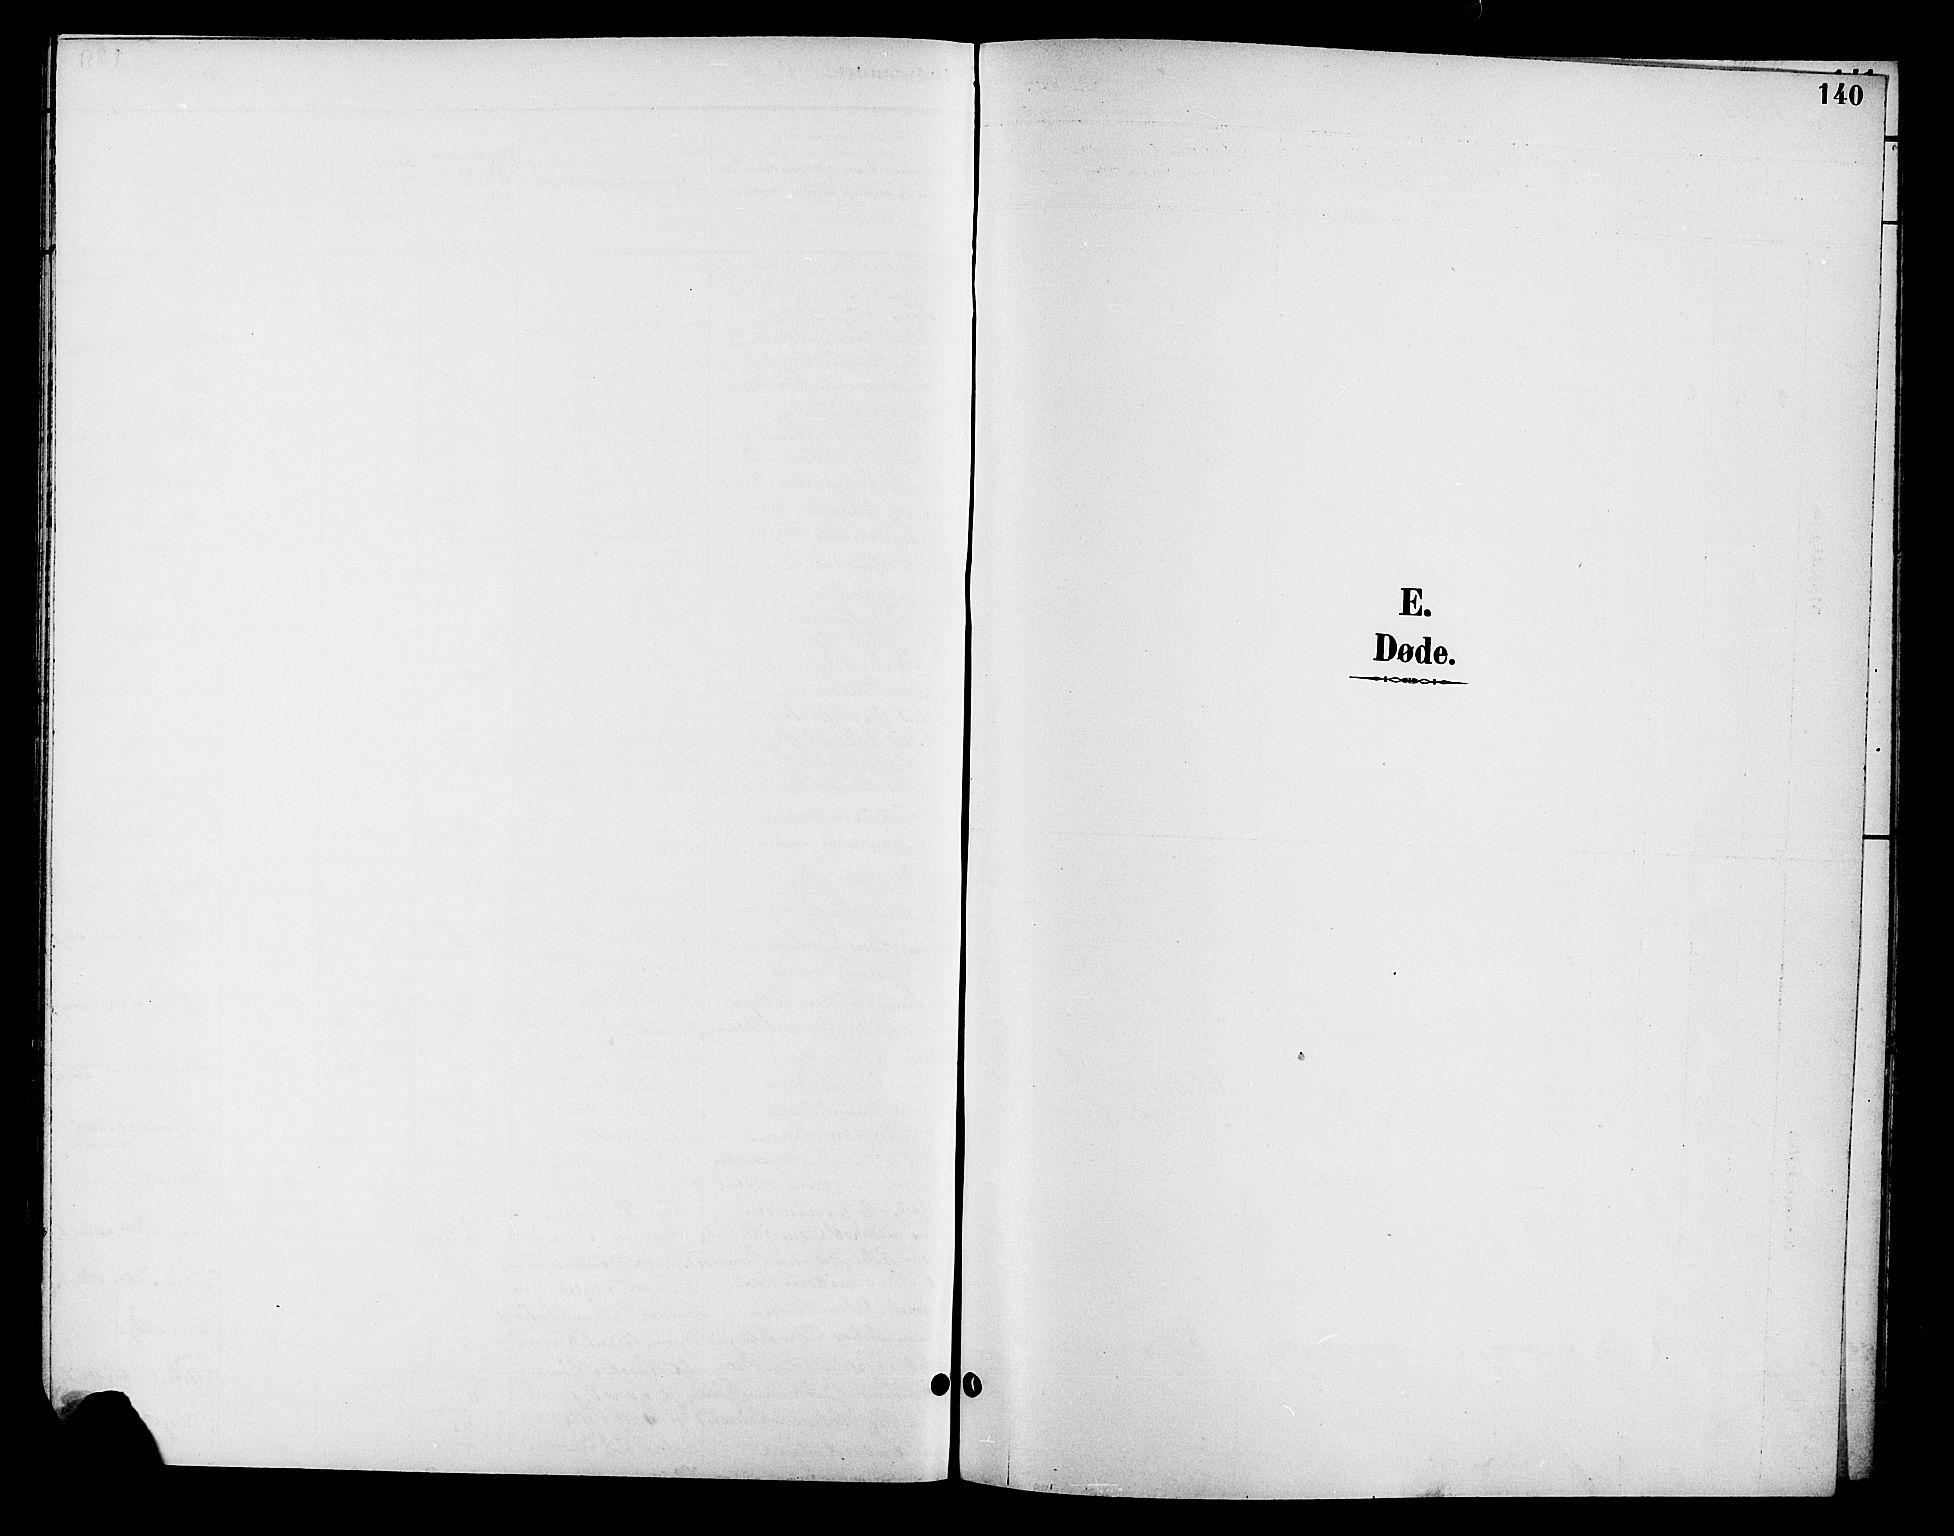 SAH, Fåberg prestekontor, Klokkerbok nr. 8, 1891-1900, s. 140